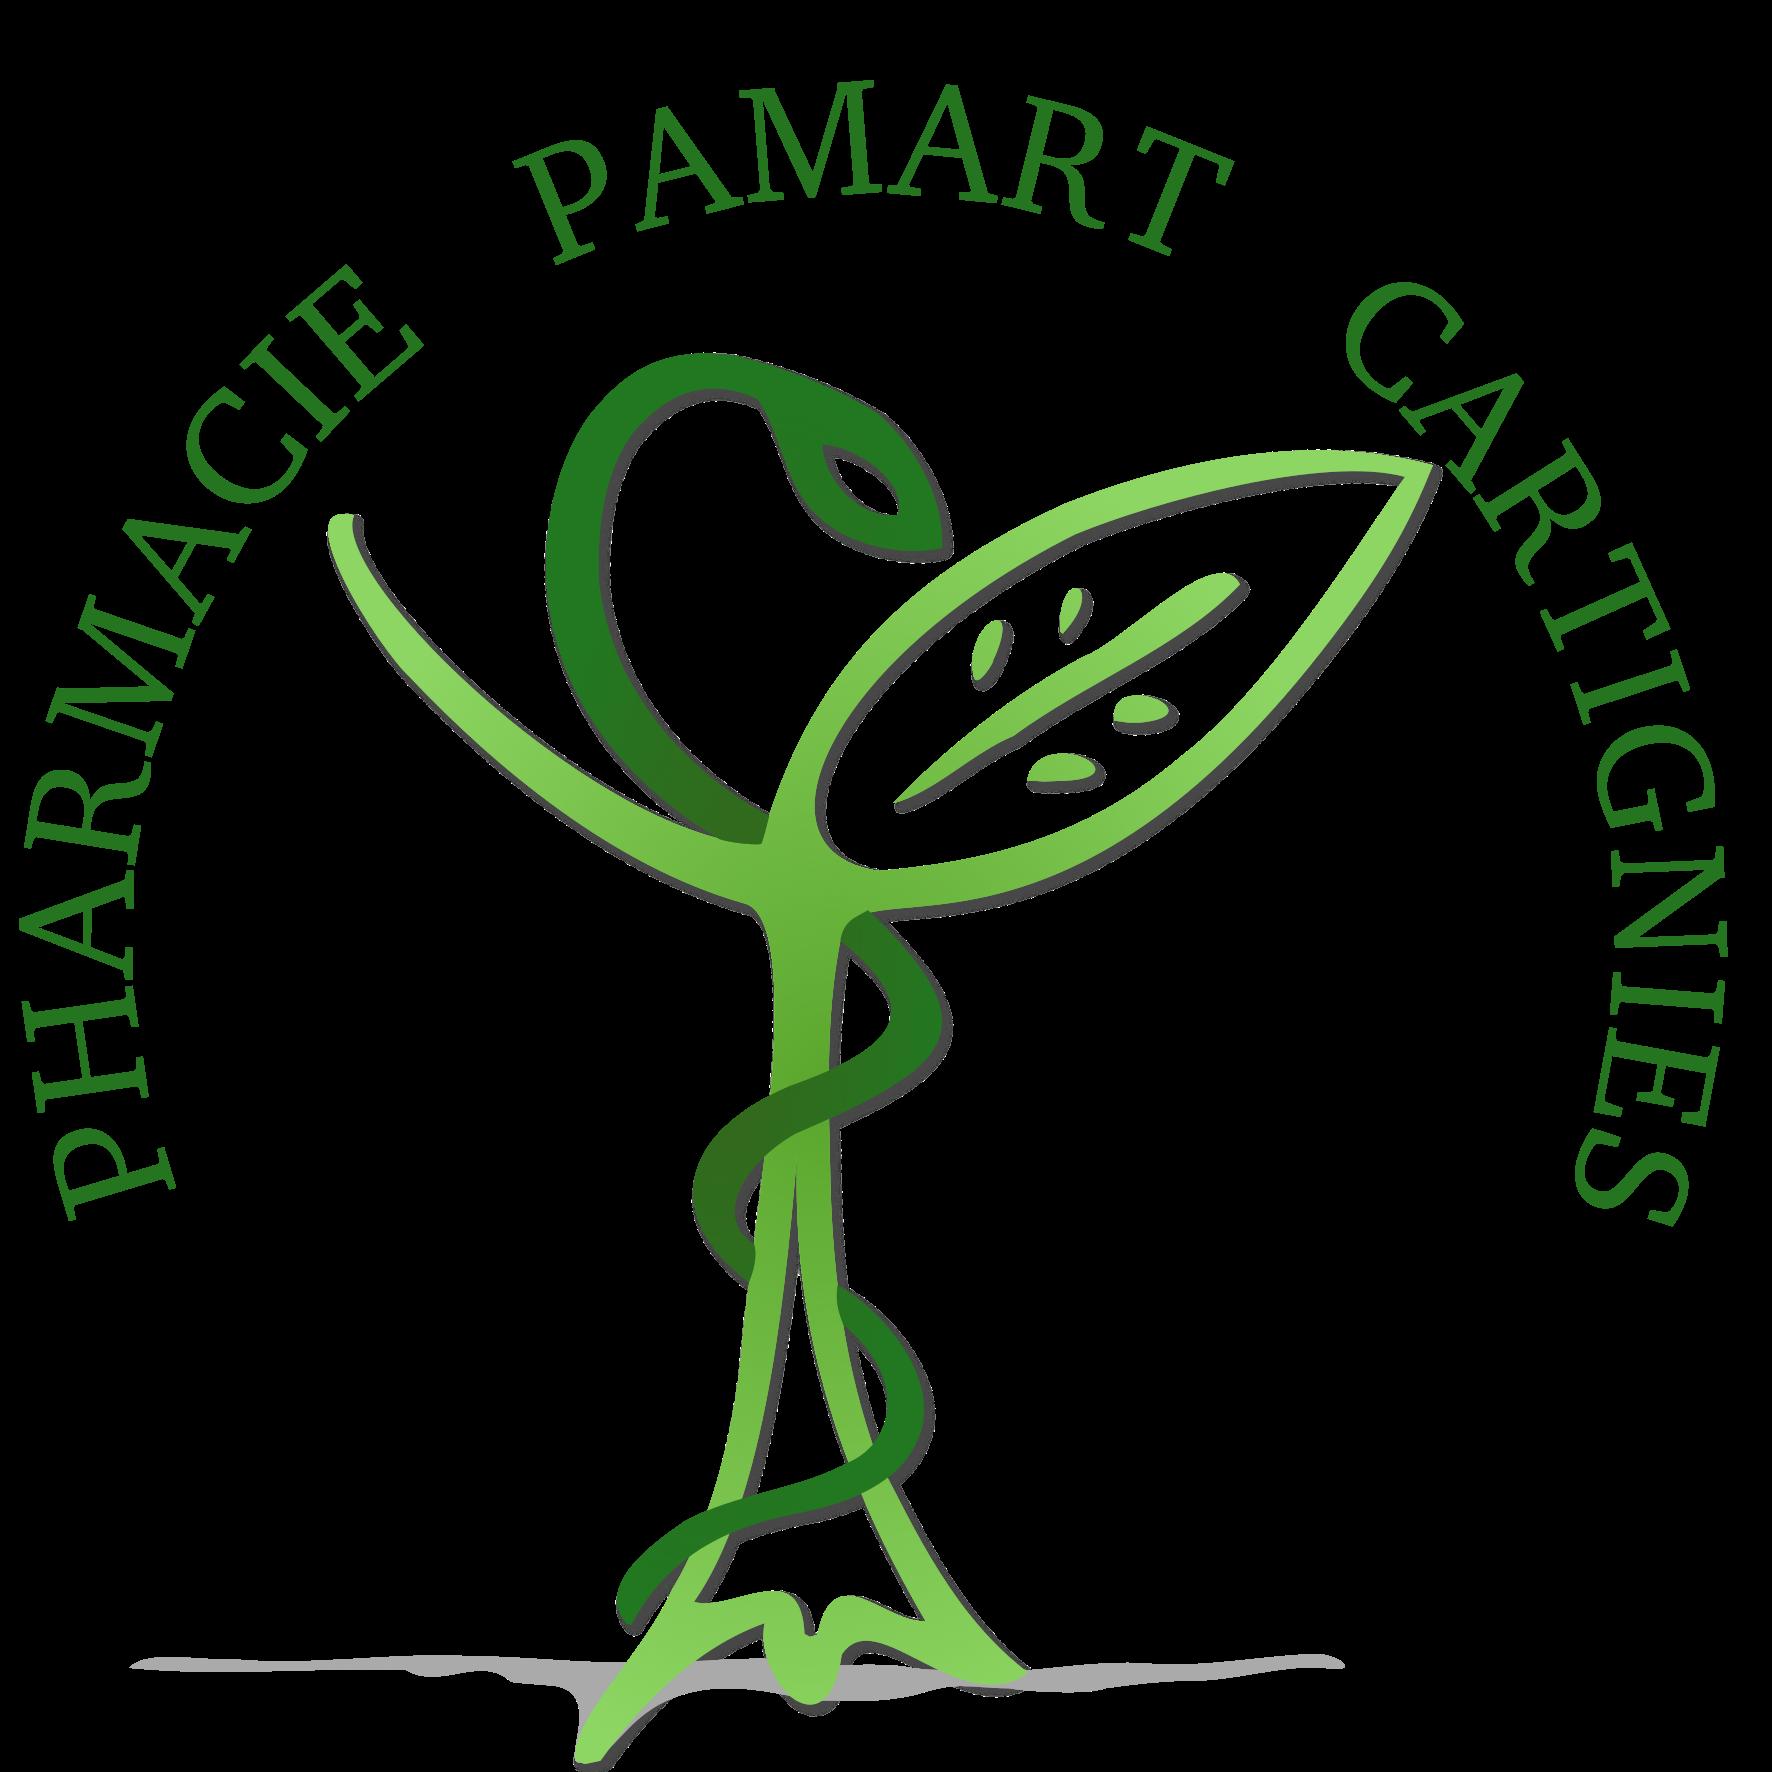 Pharmacie Pamart